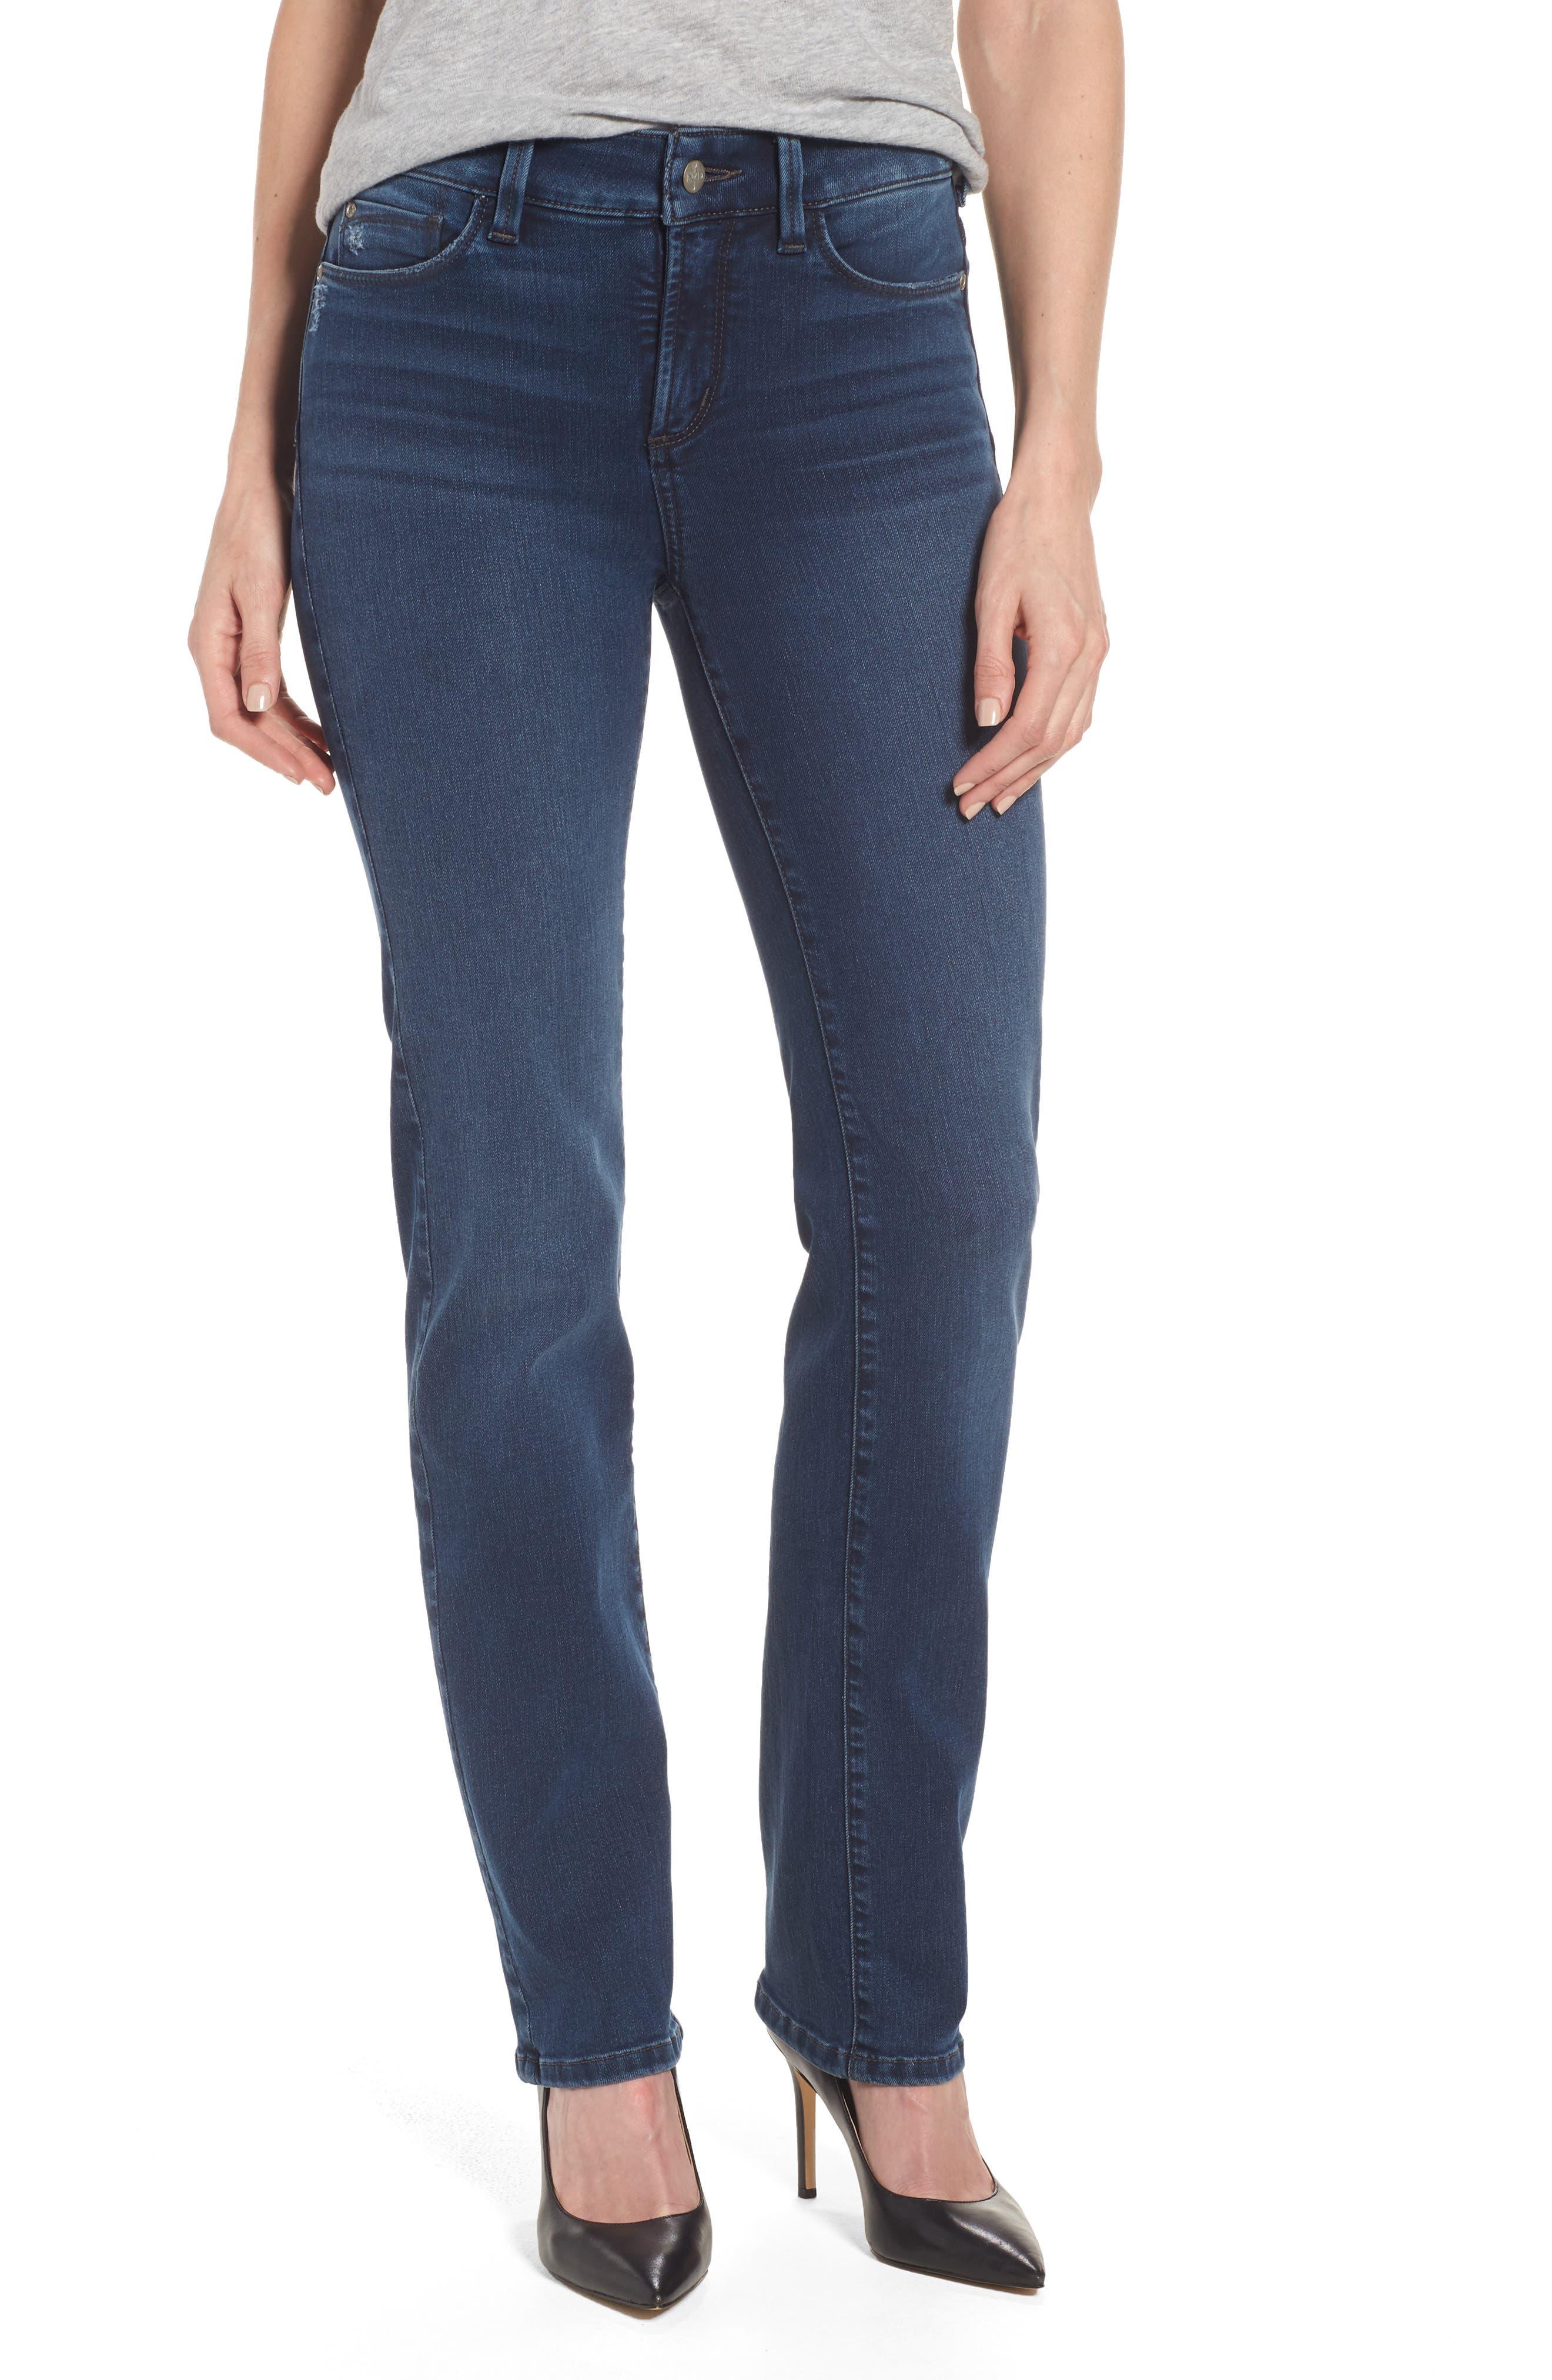 Main Image - NYDJ Marilyn Stretch Straight Leg Jeans (Traveler) (Regular & Petite)